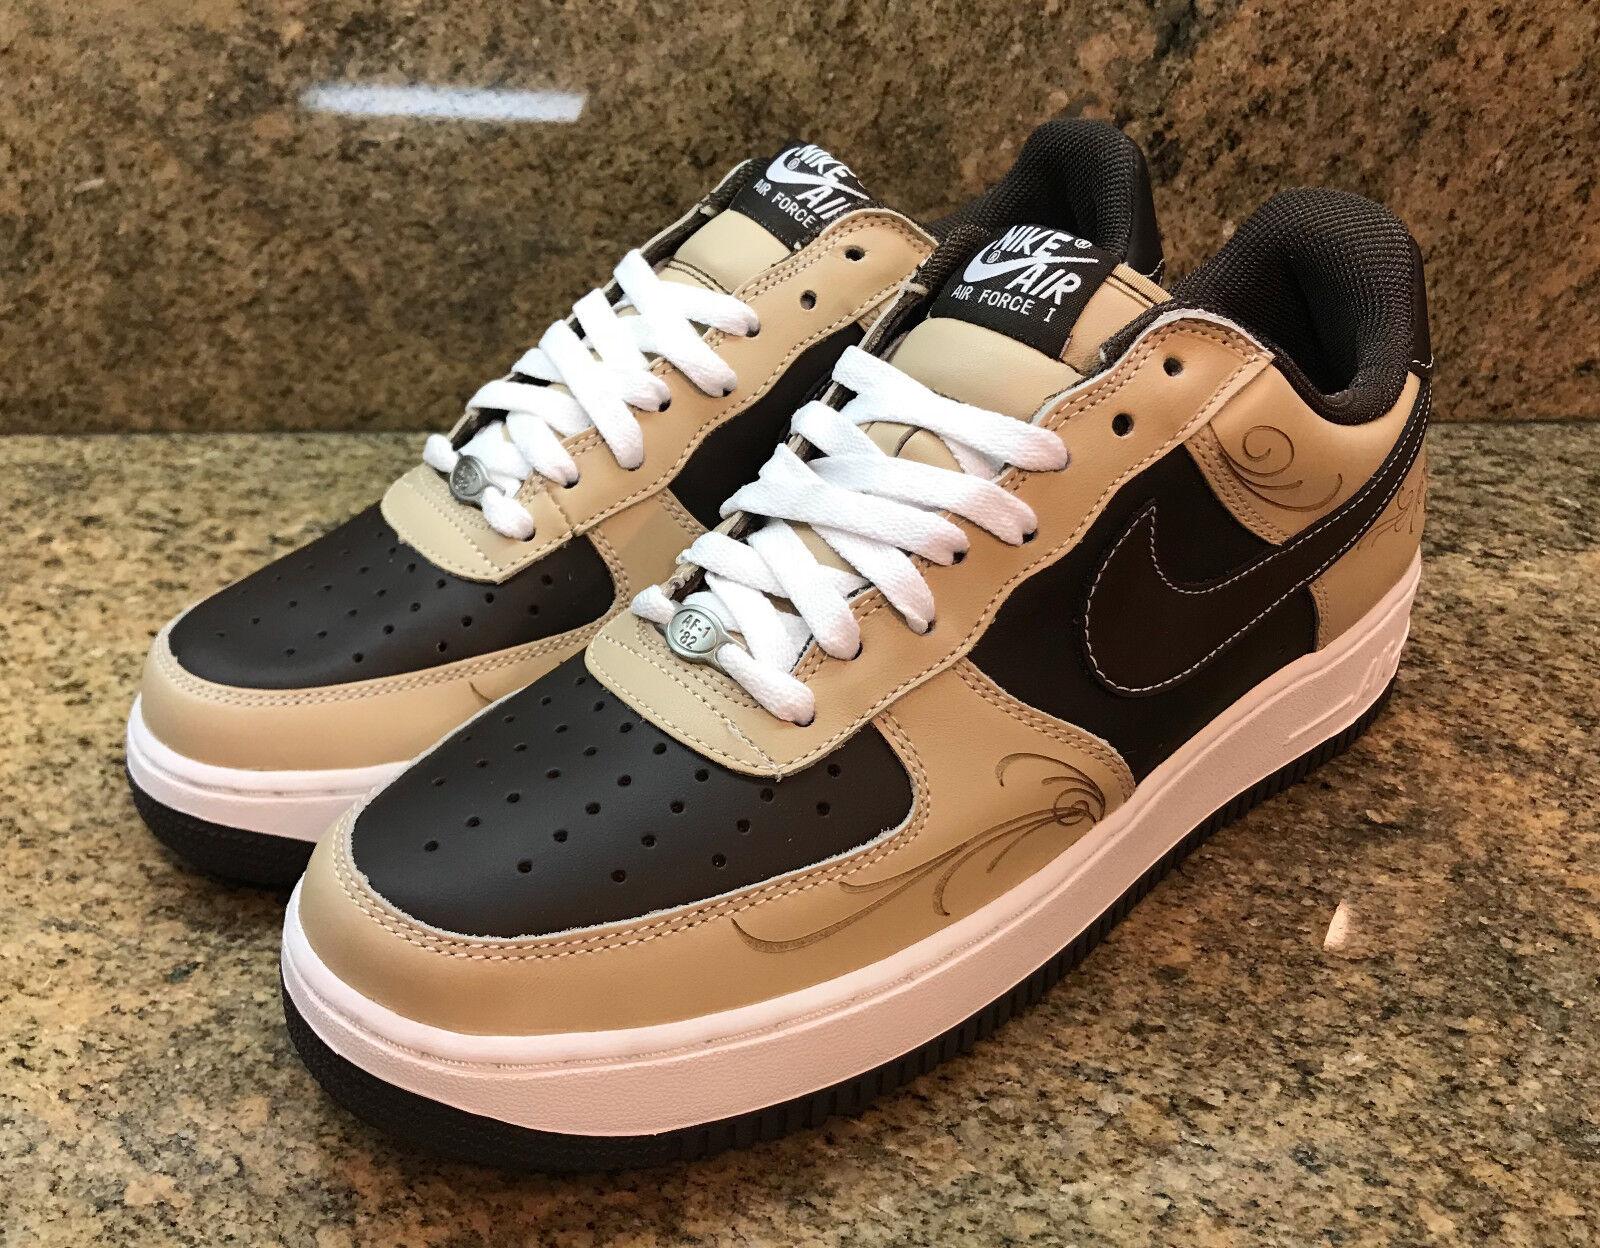 Nike Air Force 1 la 03 Mr Cartoon Brown Pride 307334 221 Men